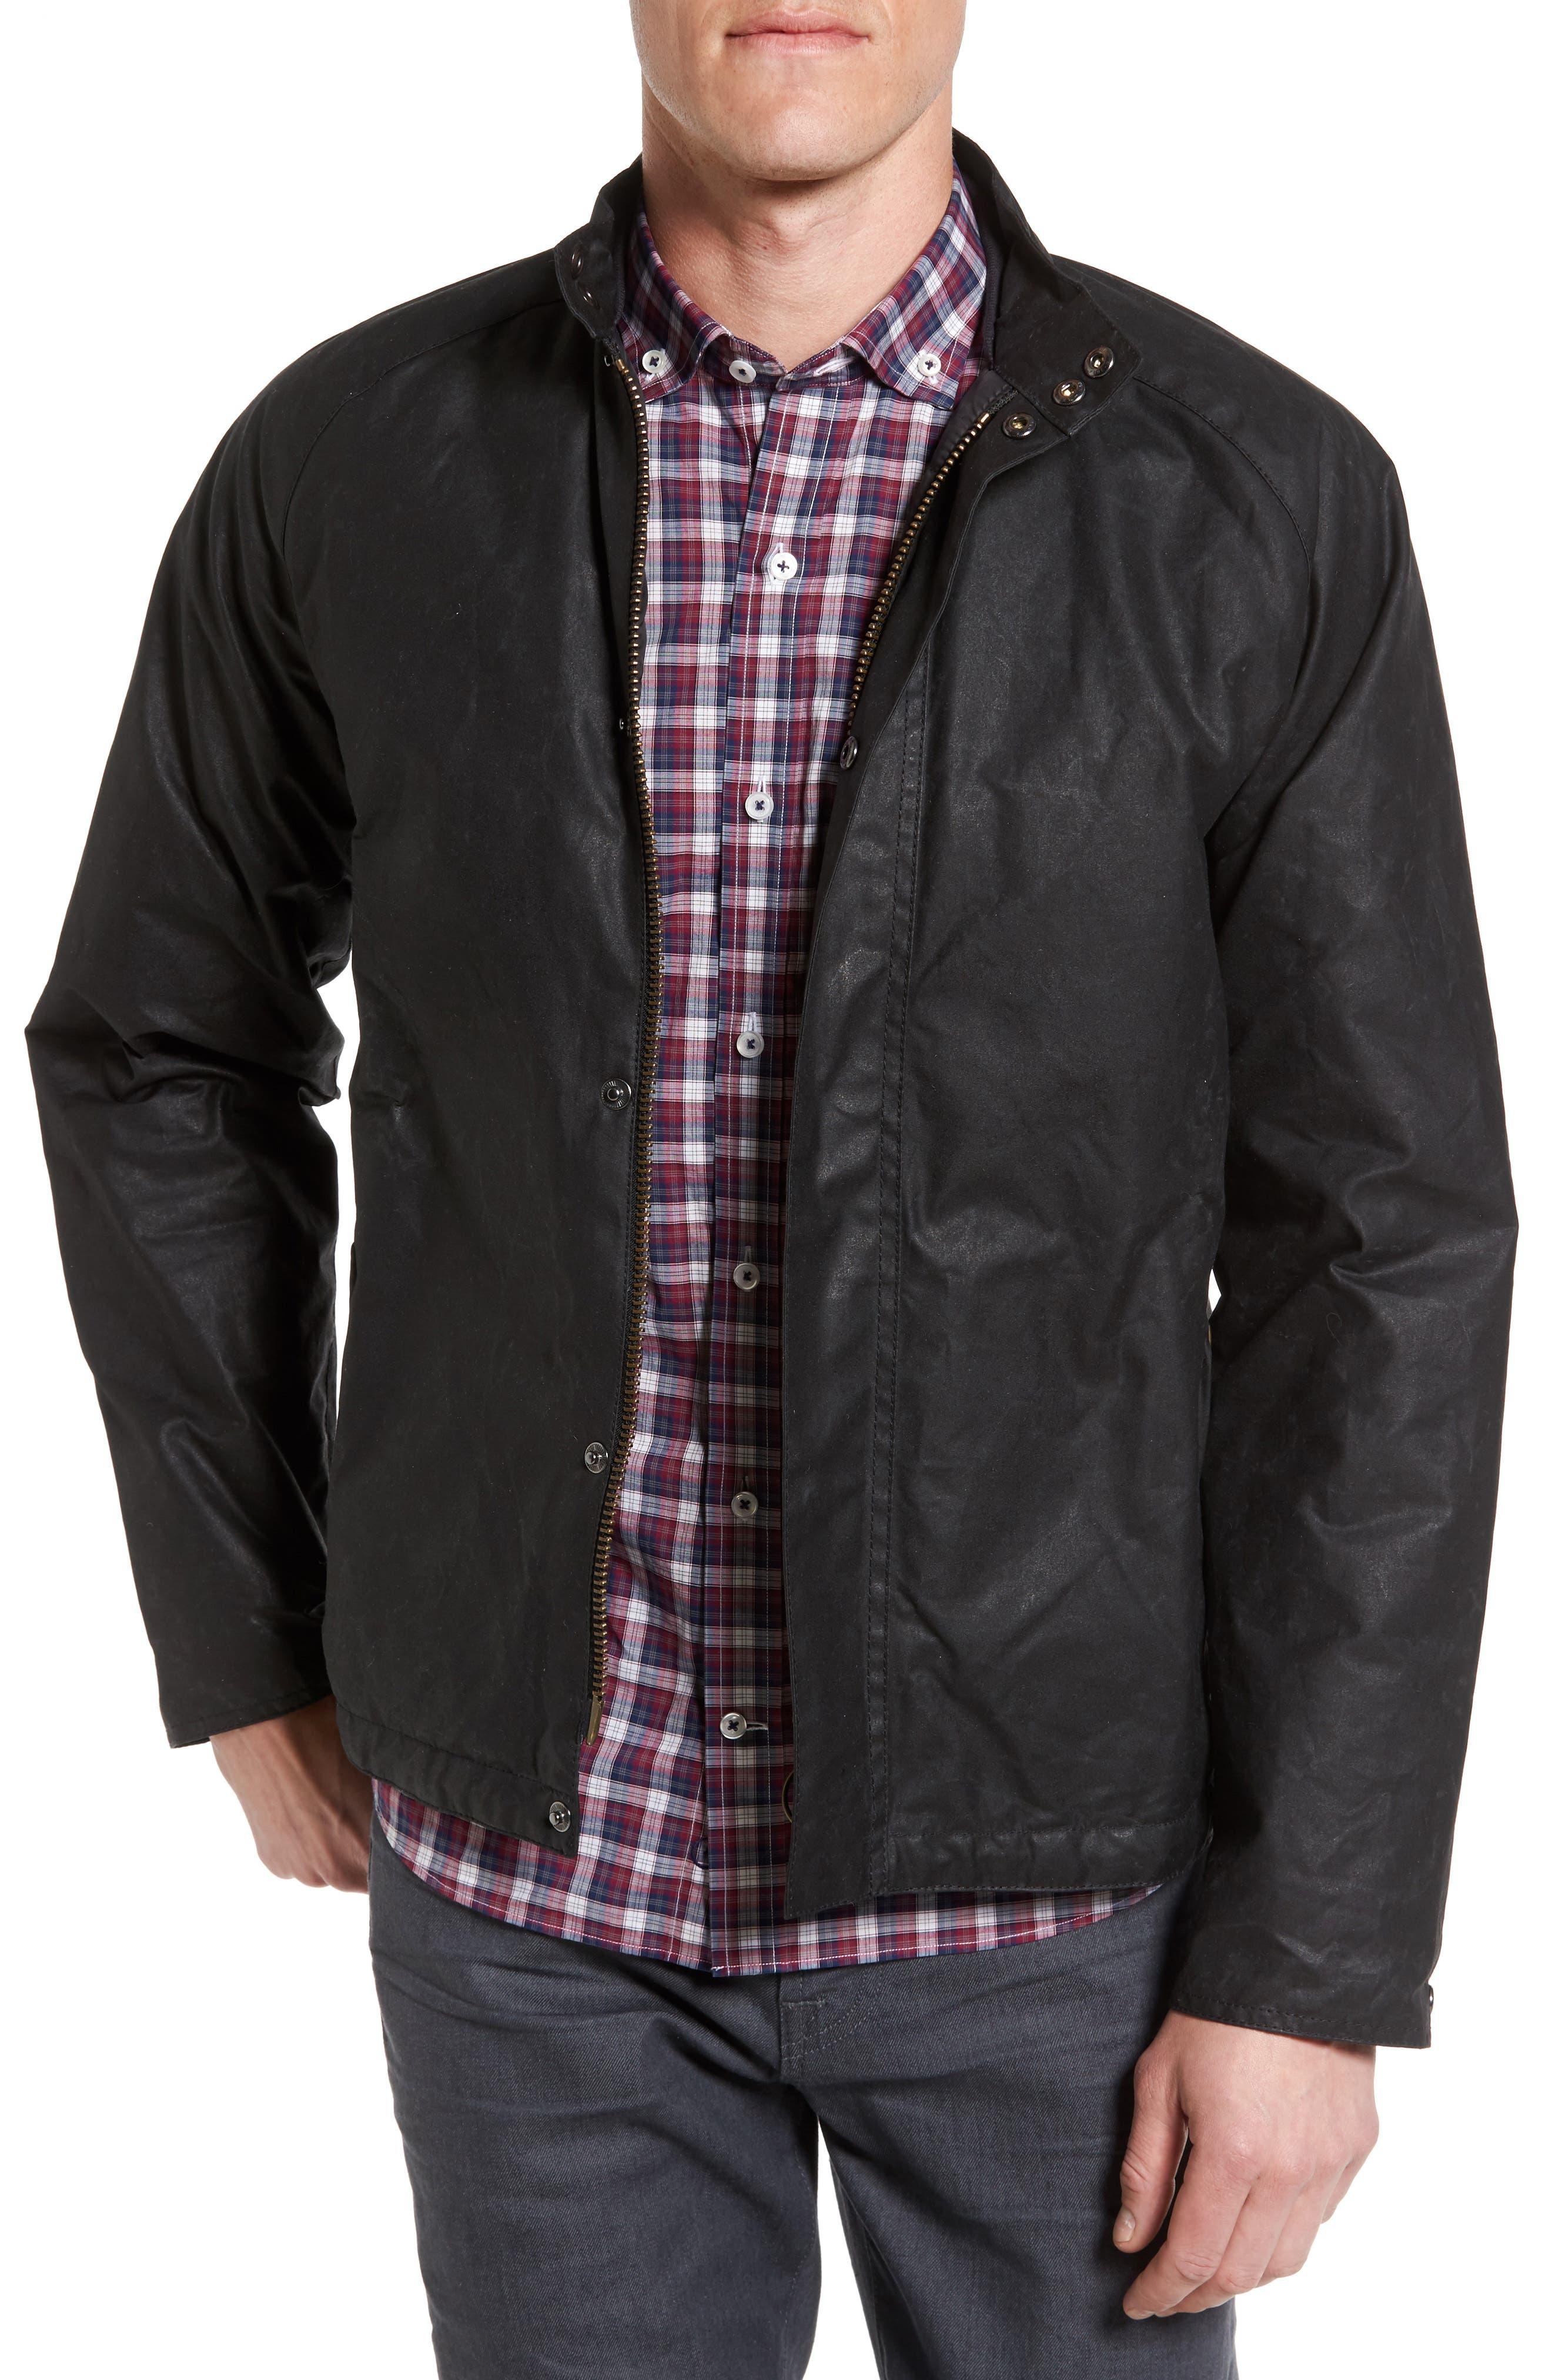 Chrome Slim Fit Water Repellent Jacket,                         Main,                         color, Black